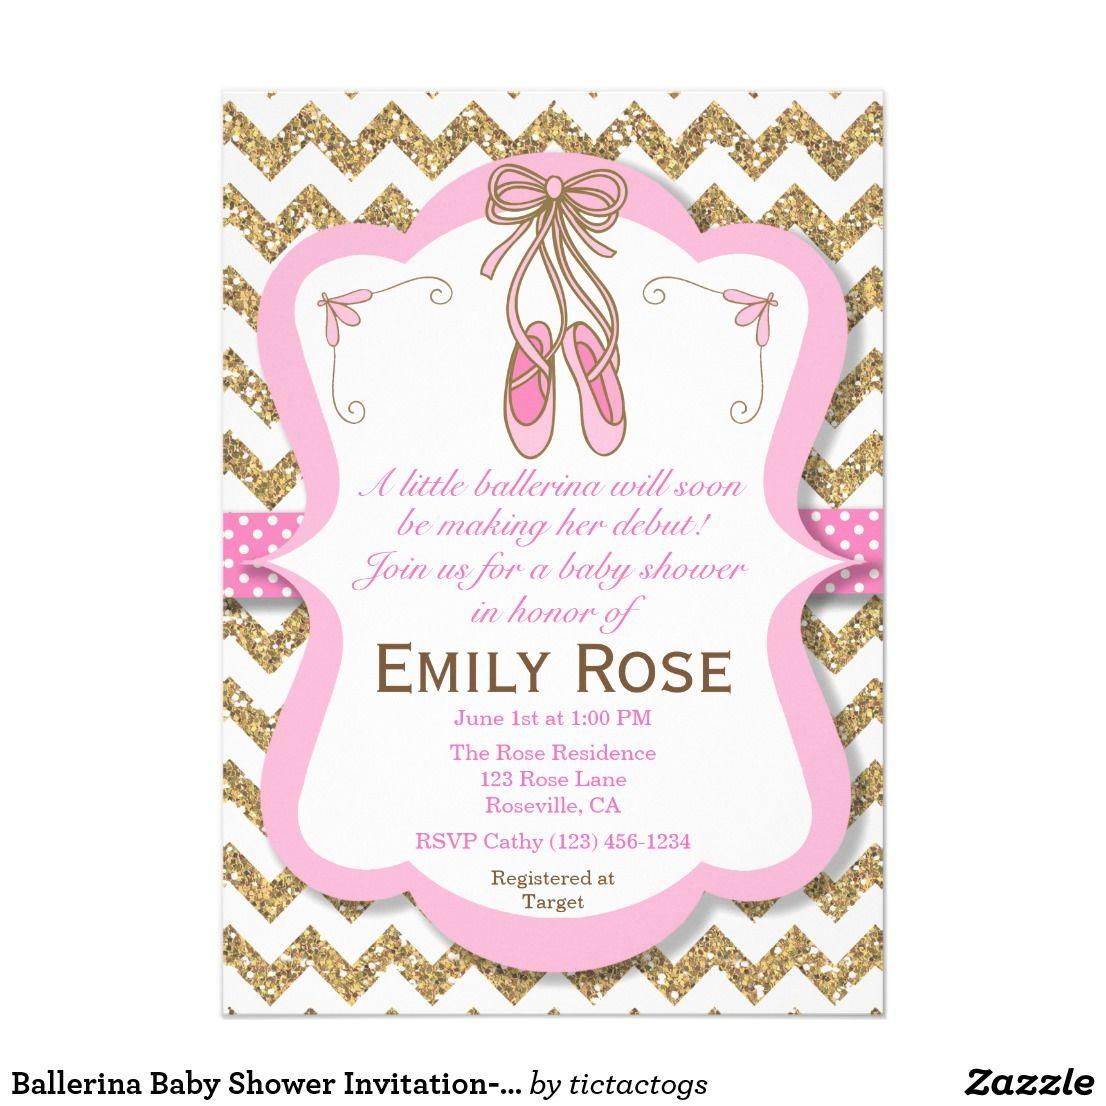 Ballerina Baby Shower Invitation- Baby Girl Invitation